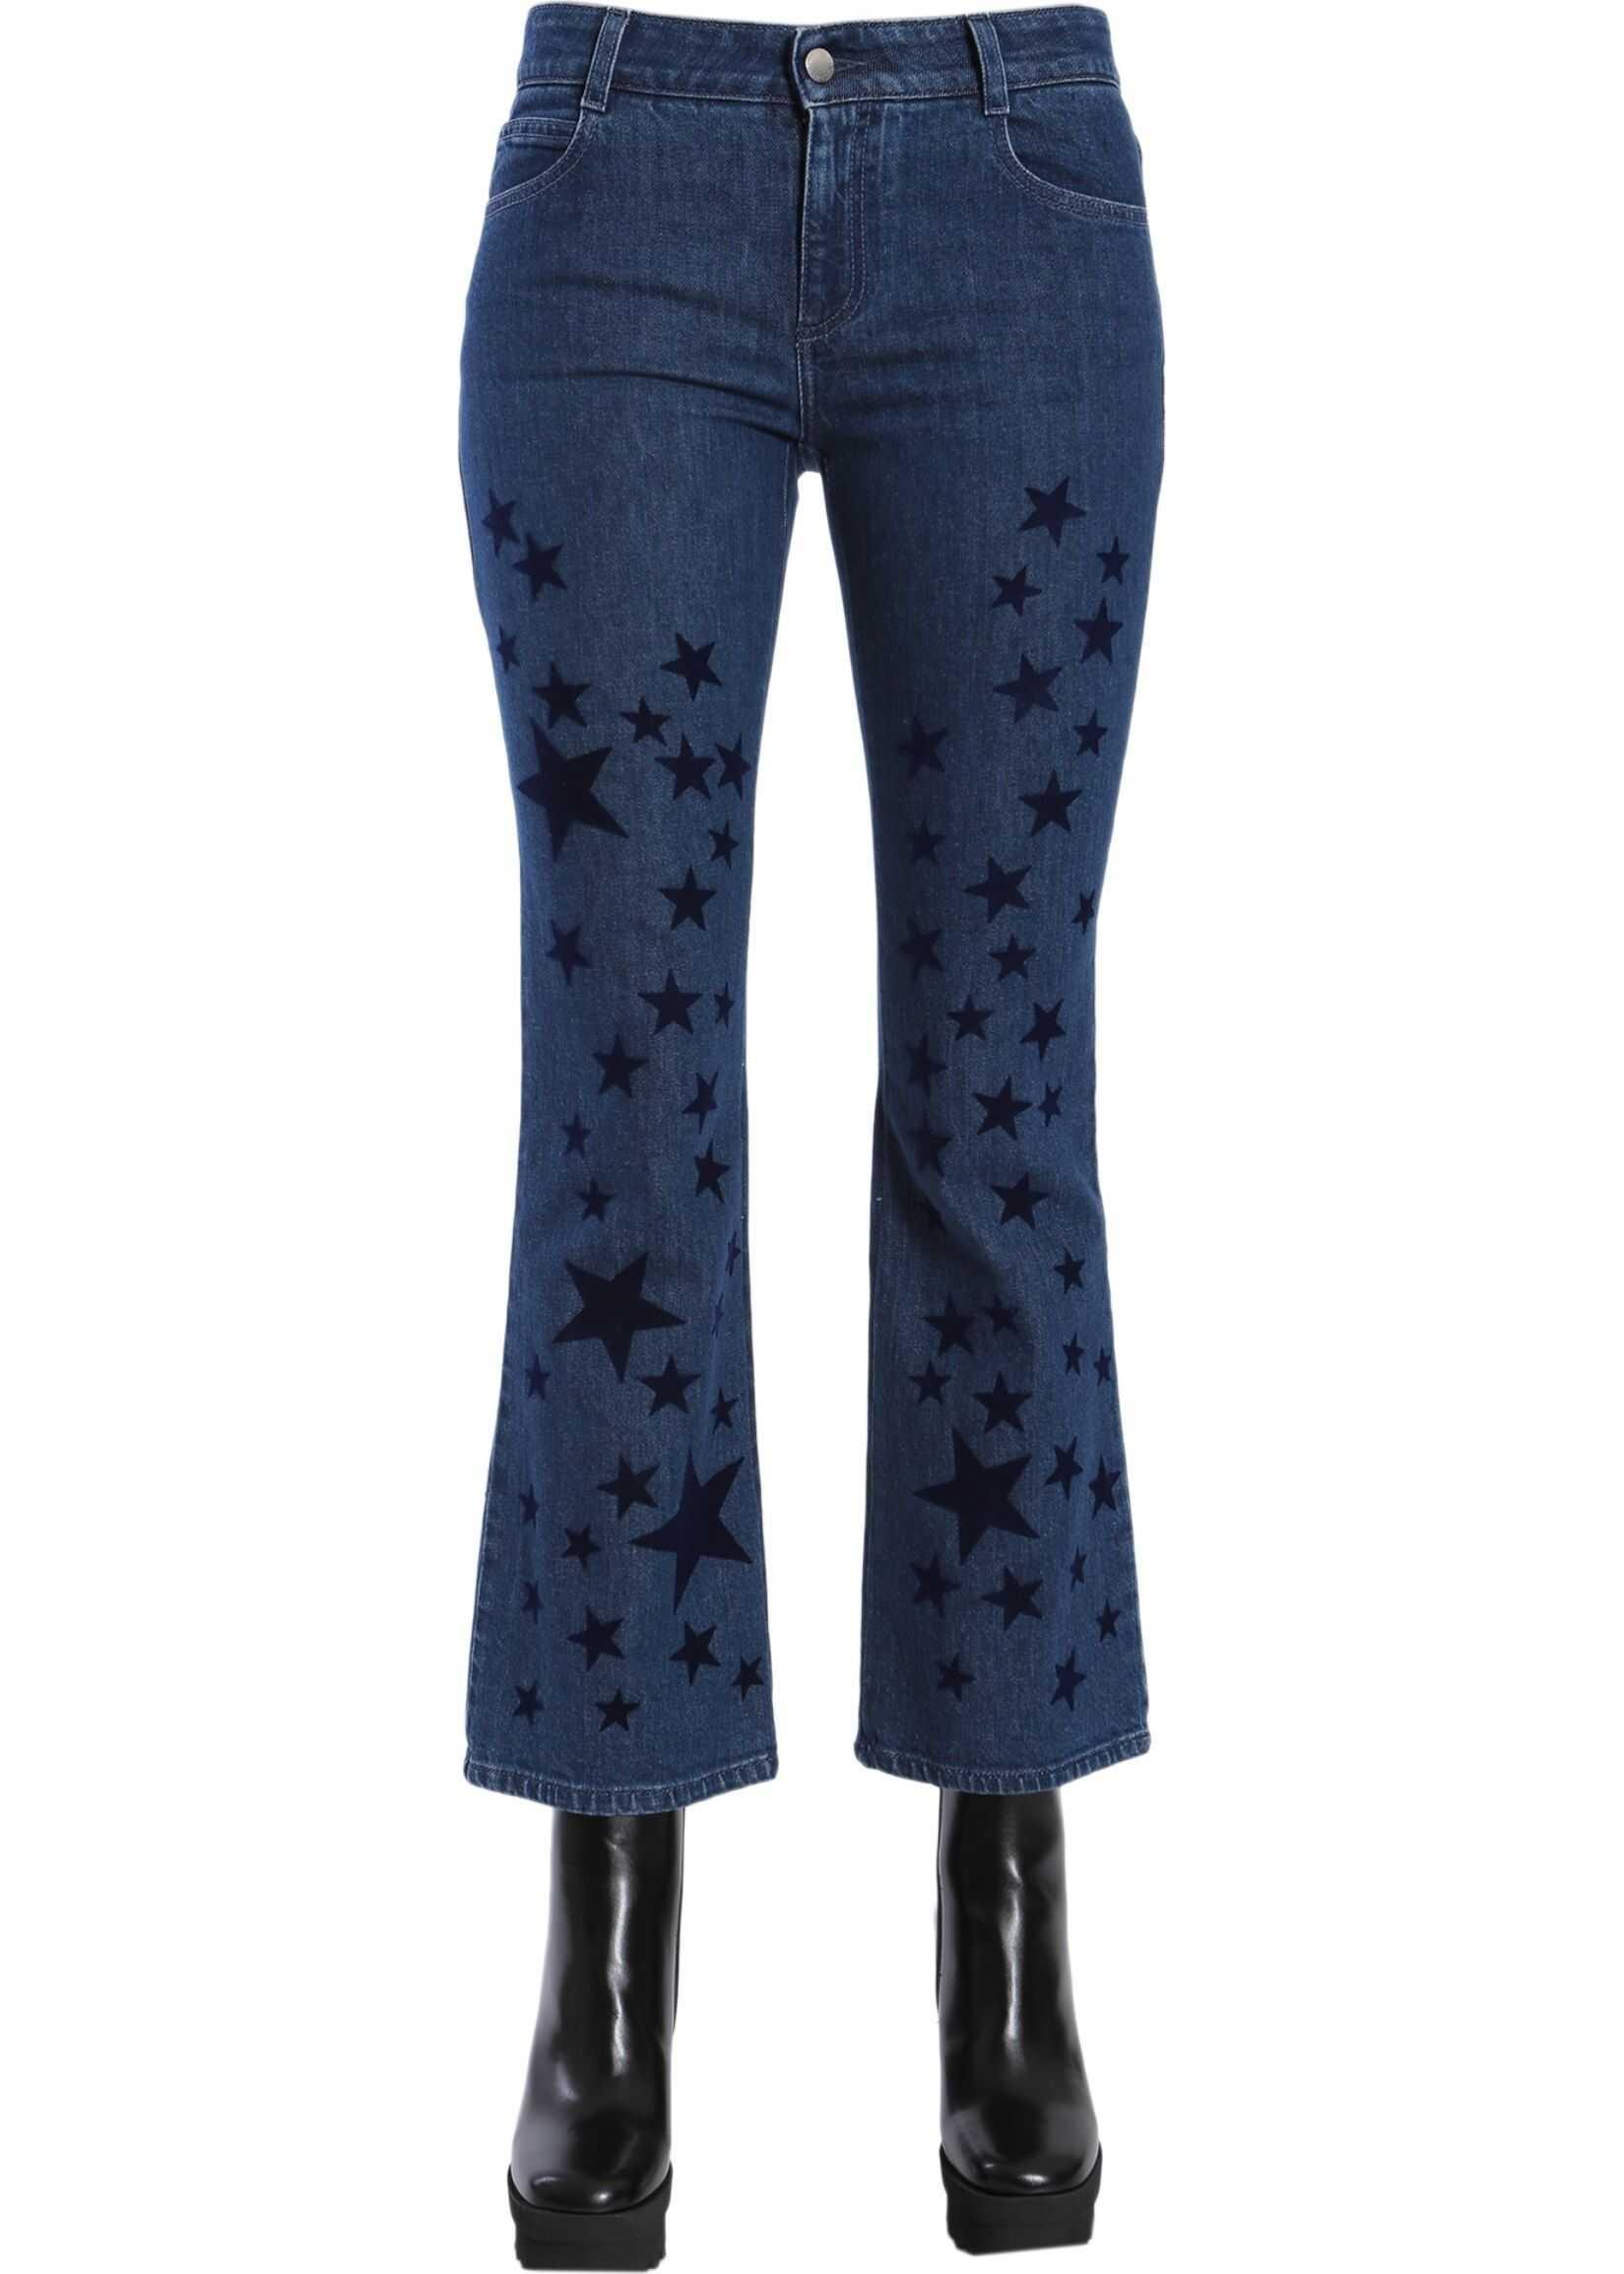 adidas by Stella McCartney Skinny Kick Jeans BLUE